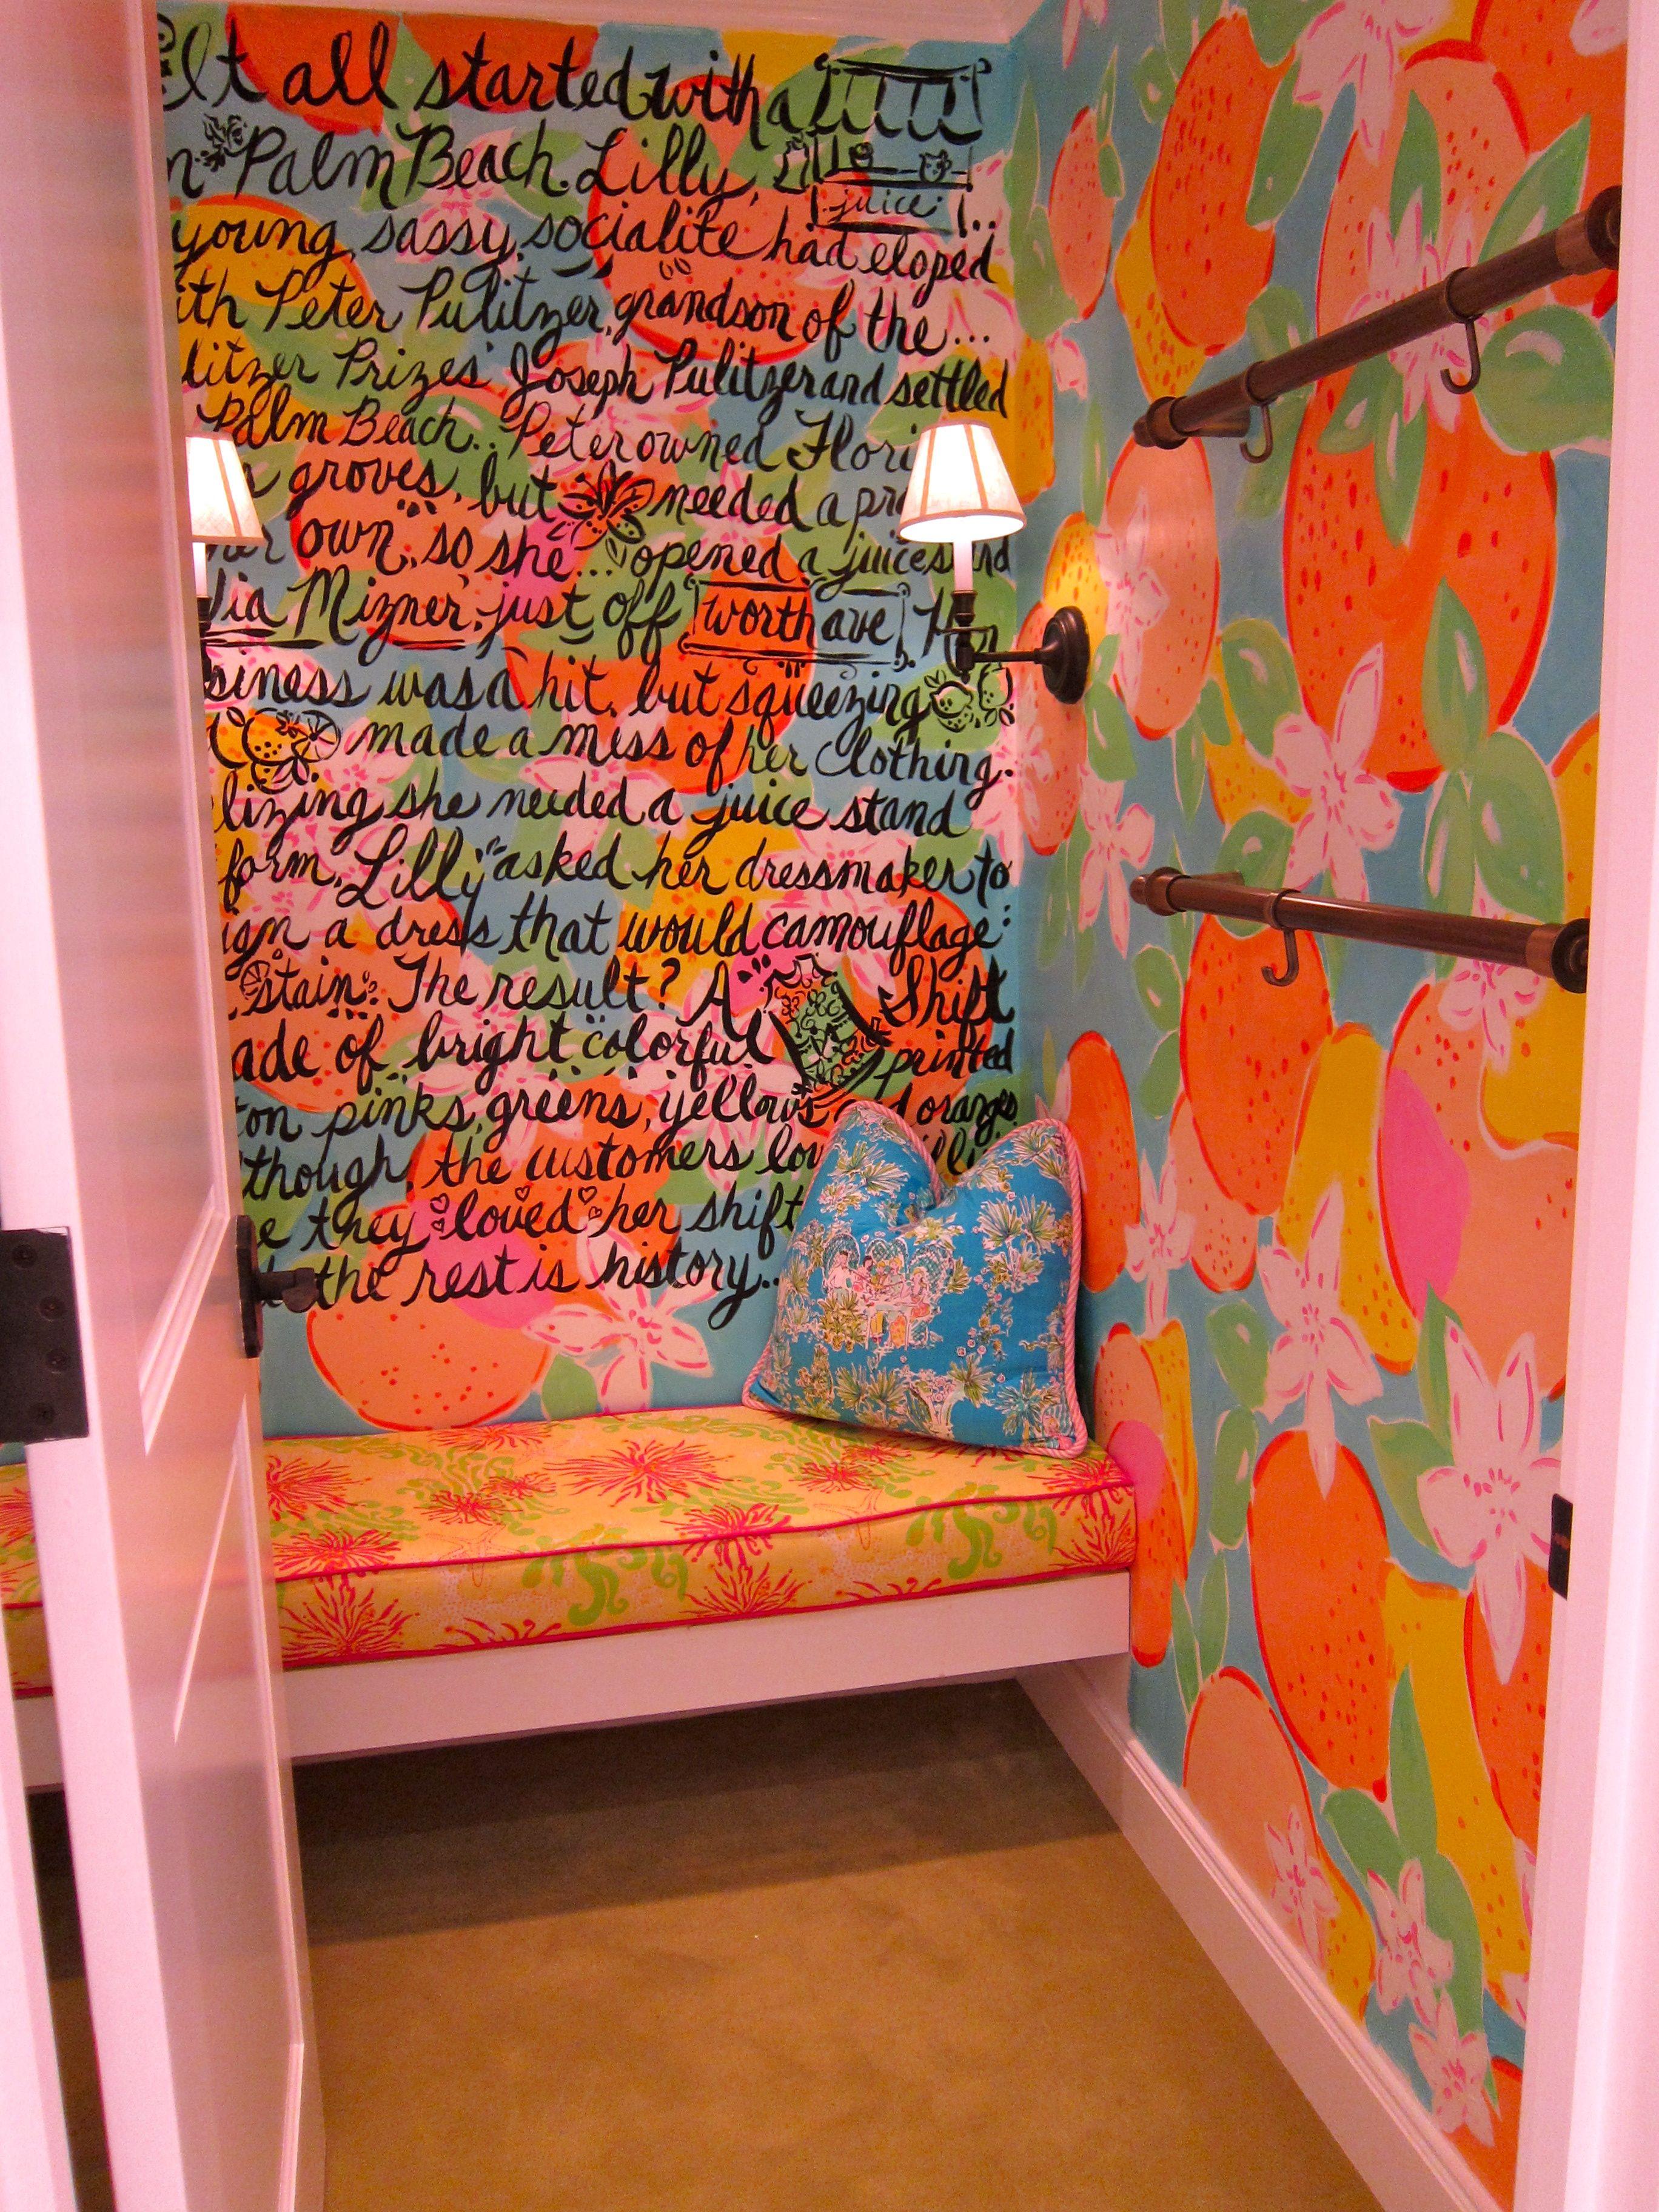 brand storytelling in the fitting room inside a lilly pulitzer brand storytelling in the fitting room inside a lilly pulitzer store retail branding